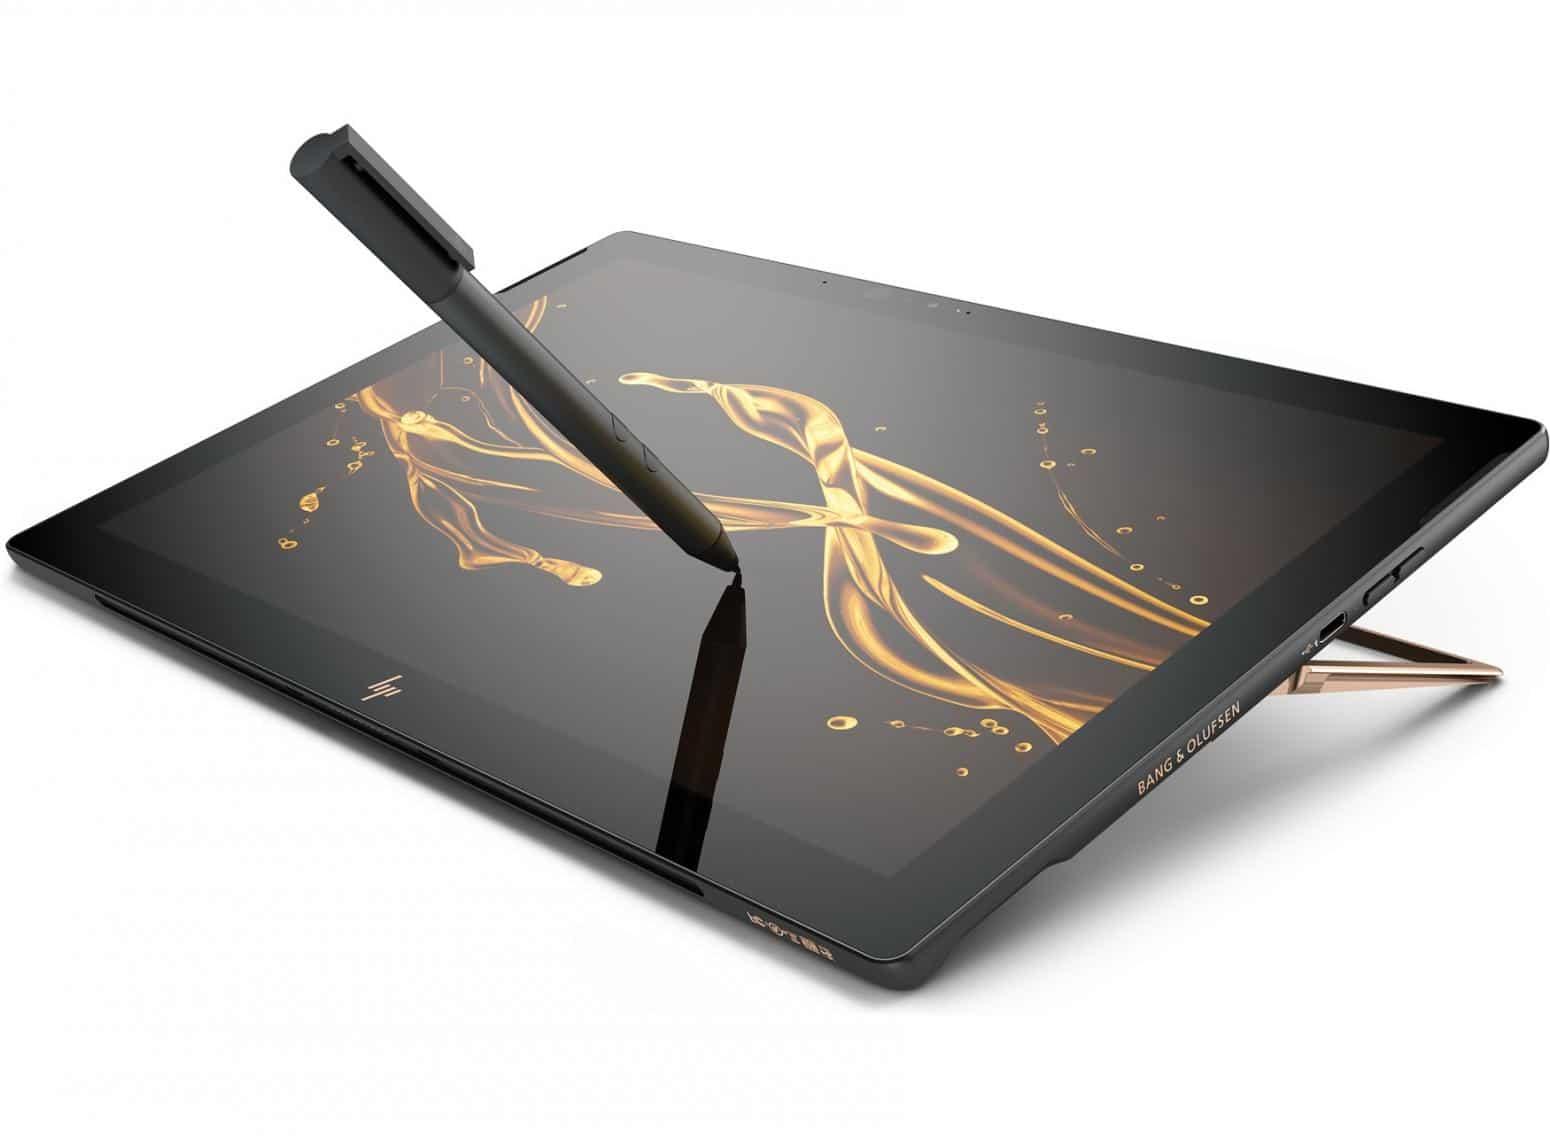 HP Spectre x2 12-c001nf, ultrabook/tablette 12 pouces 3K/2K (1540€)